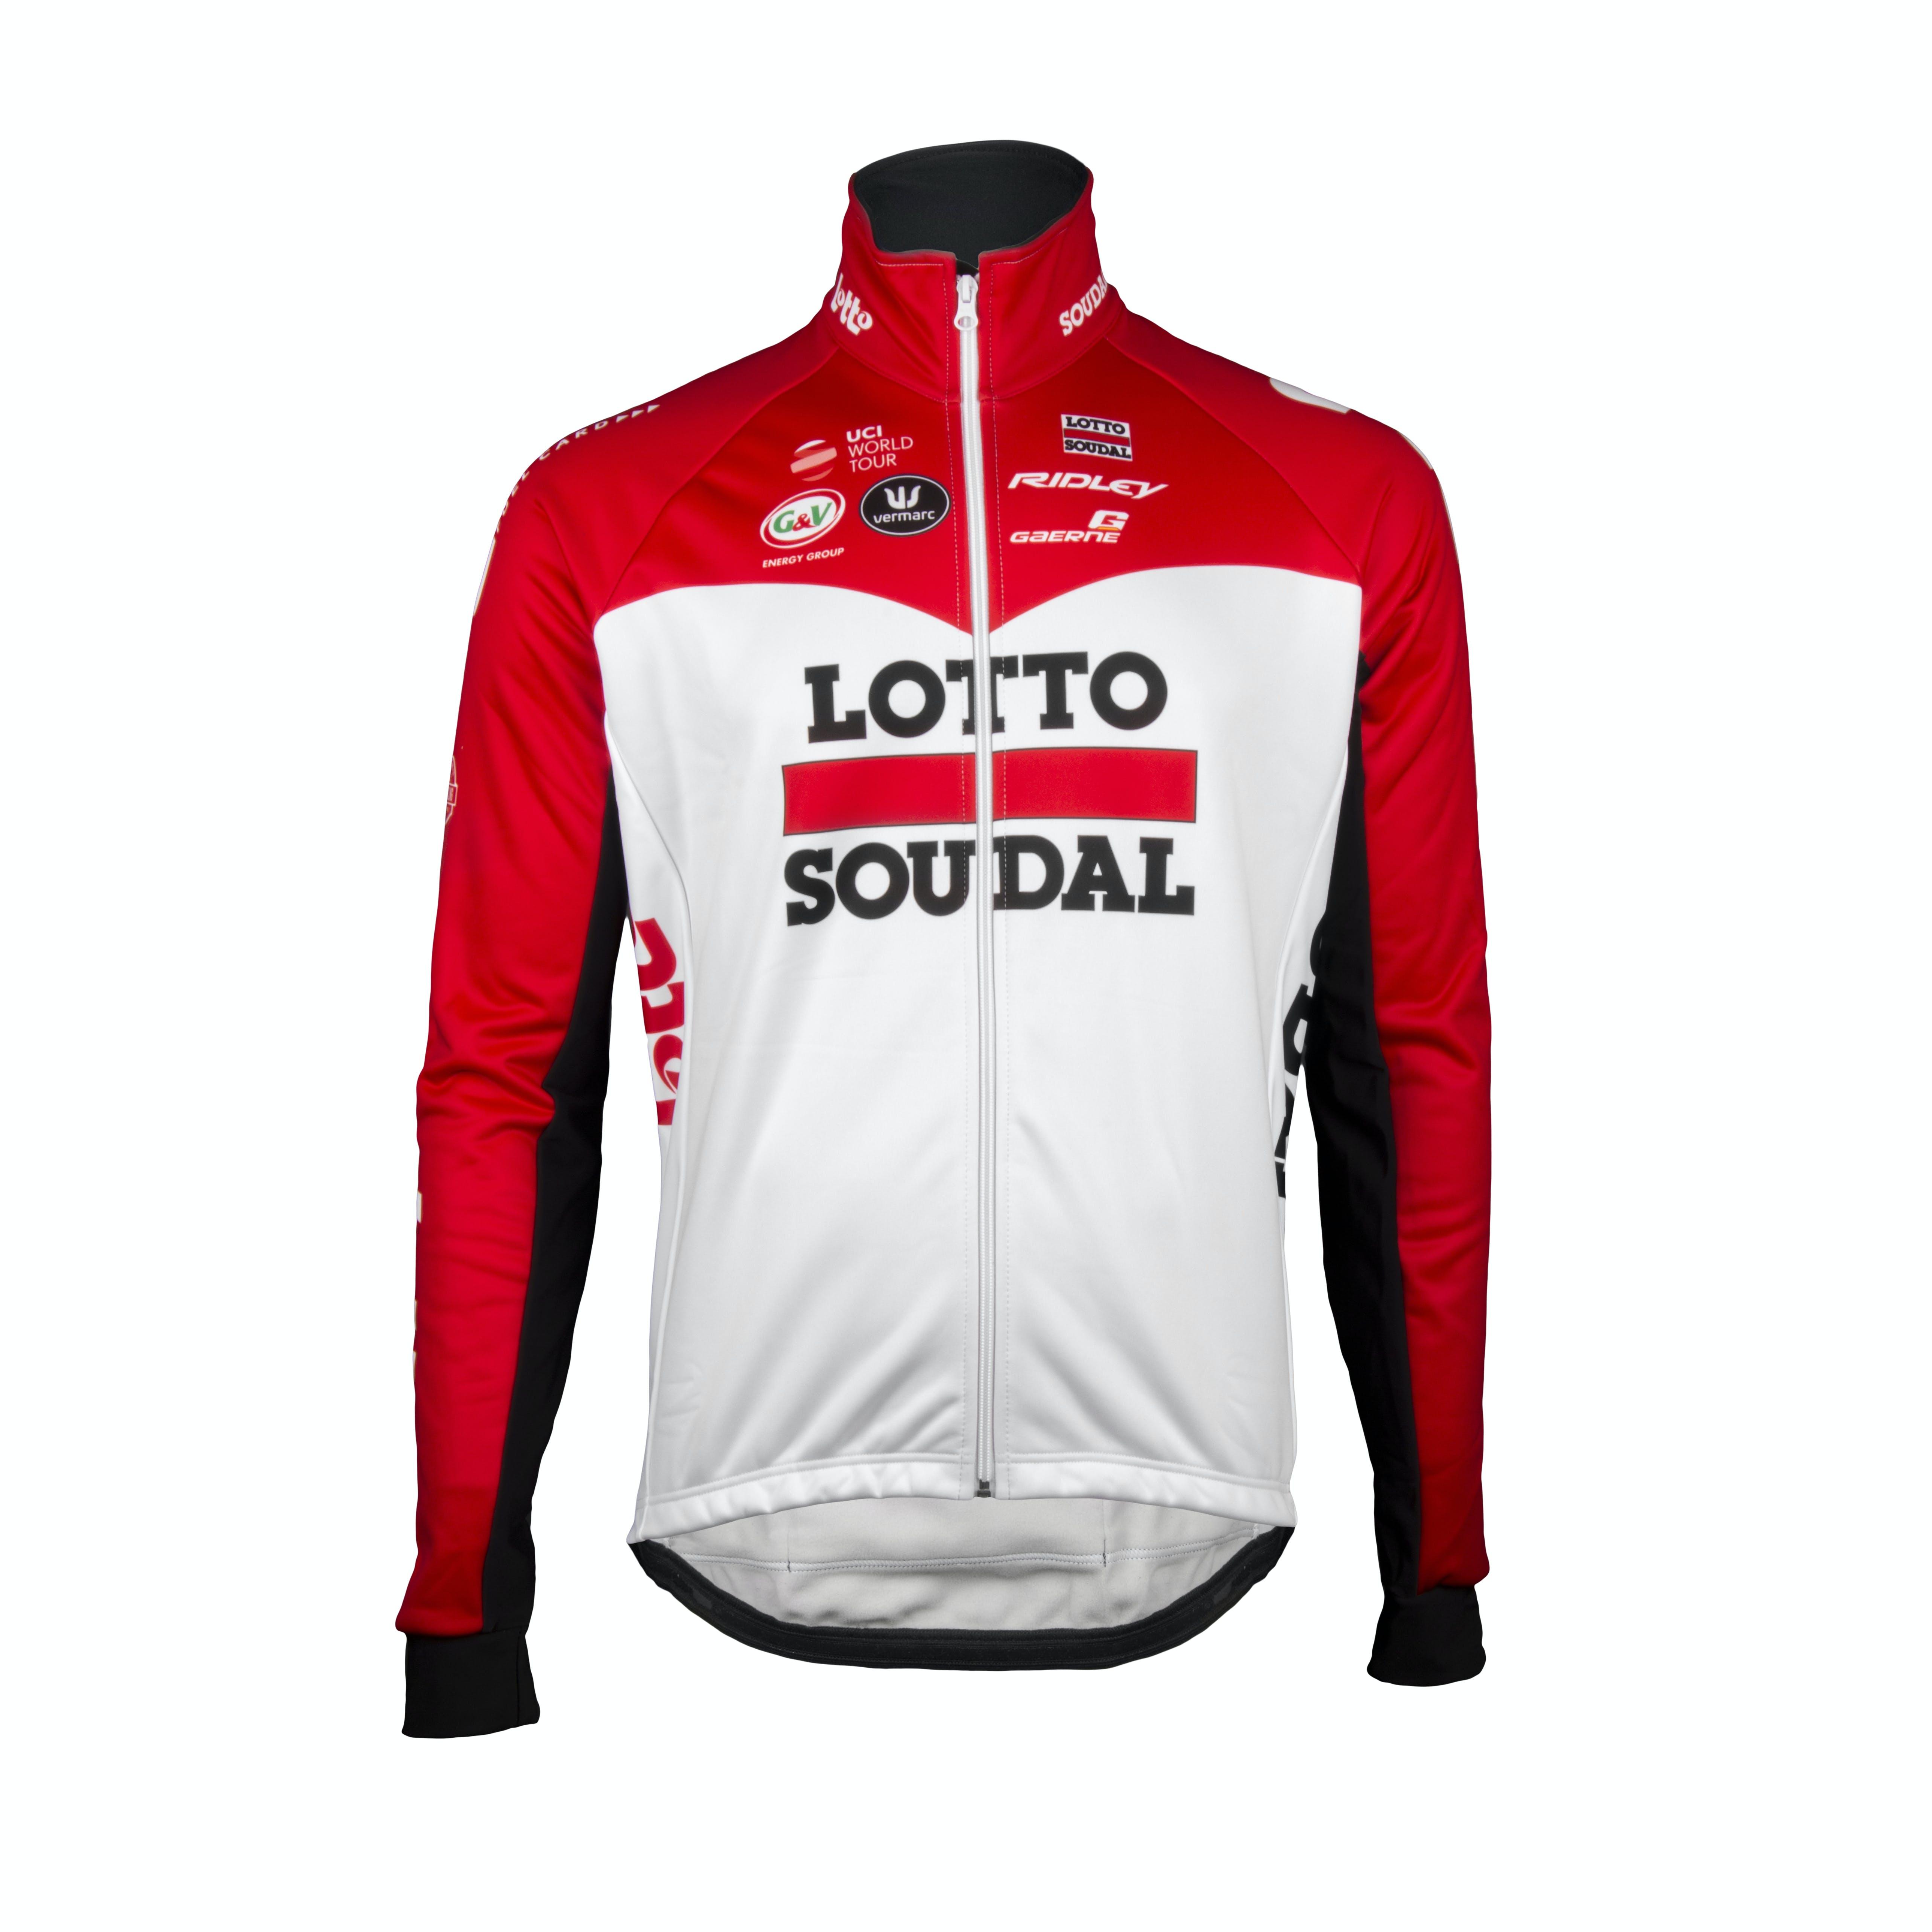 Lotto Soudal 2018 Veste Technical